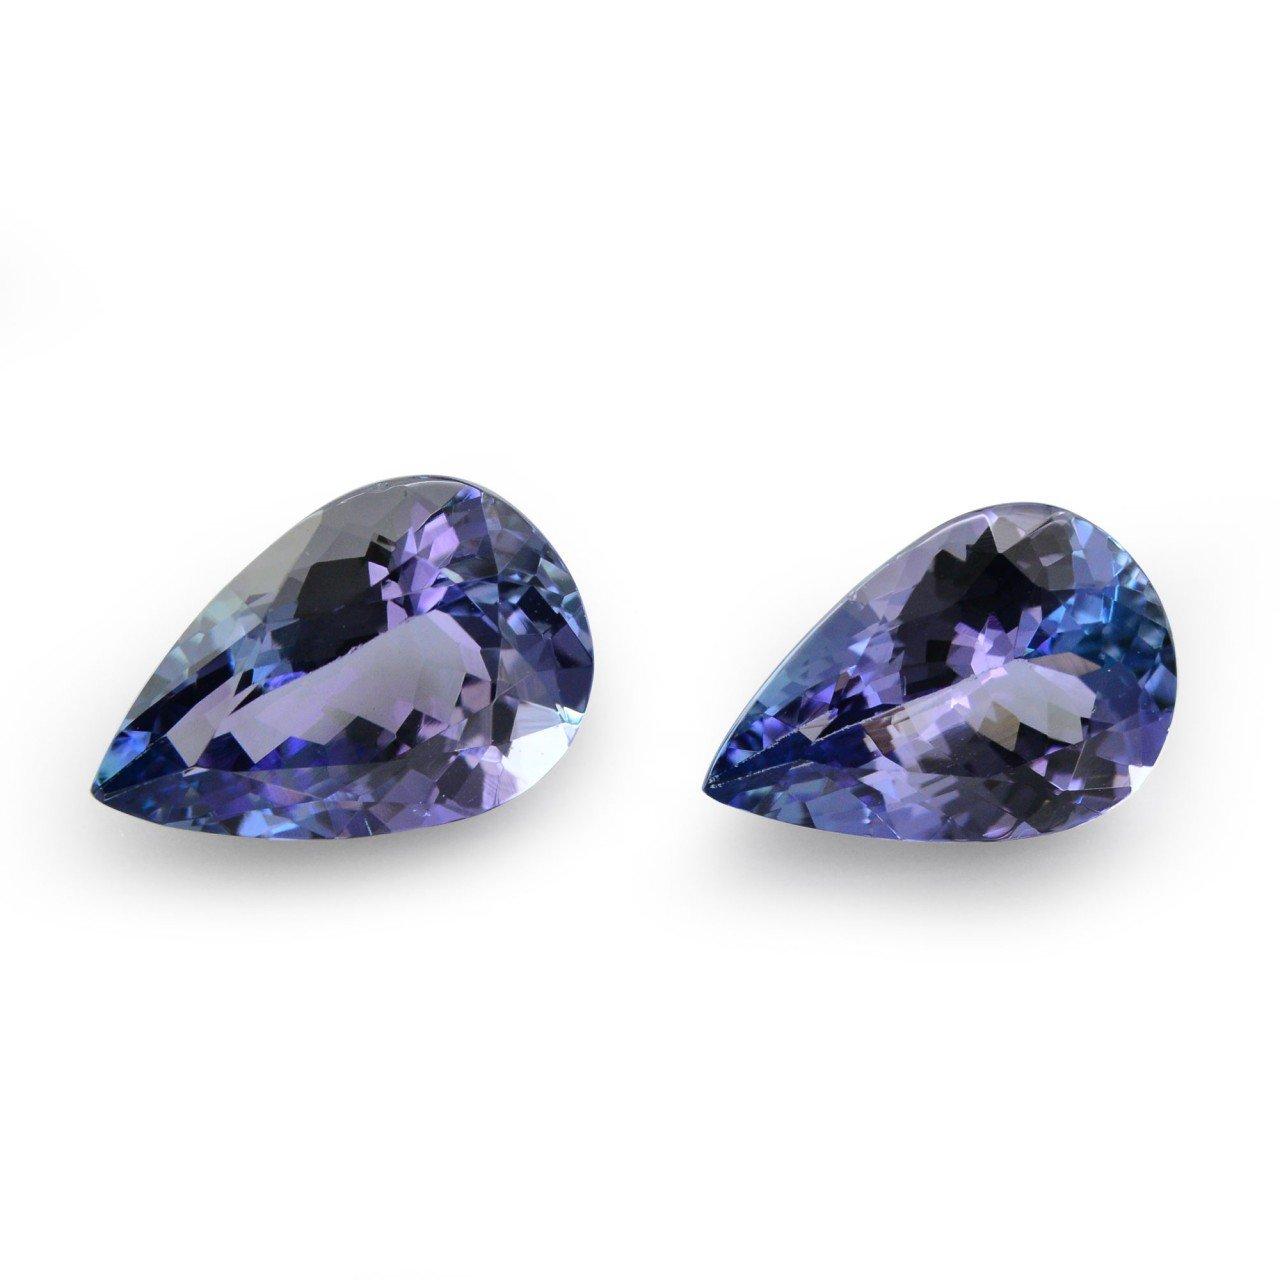 5.08Cts Blue Tanzanite Loose Gemstone Pear Shape Pair